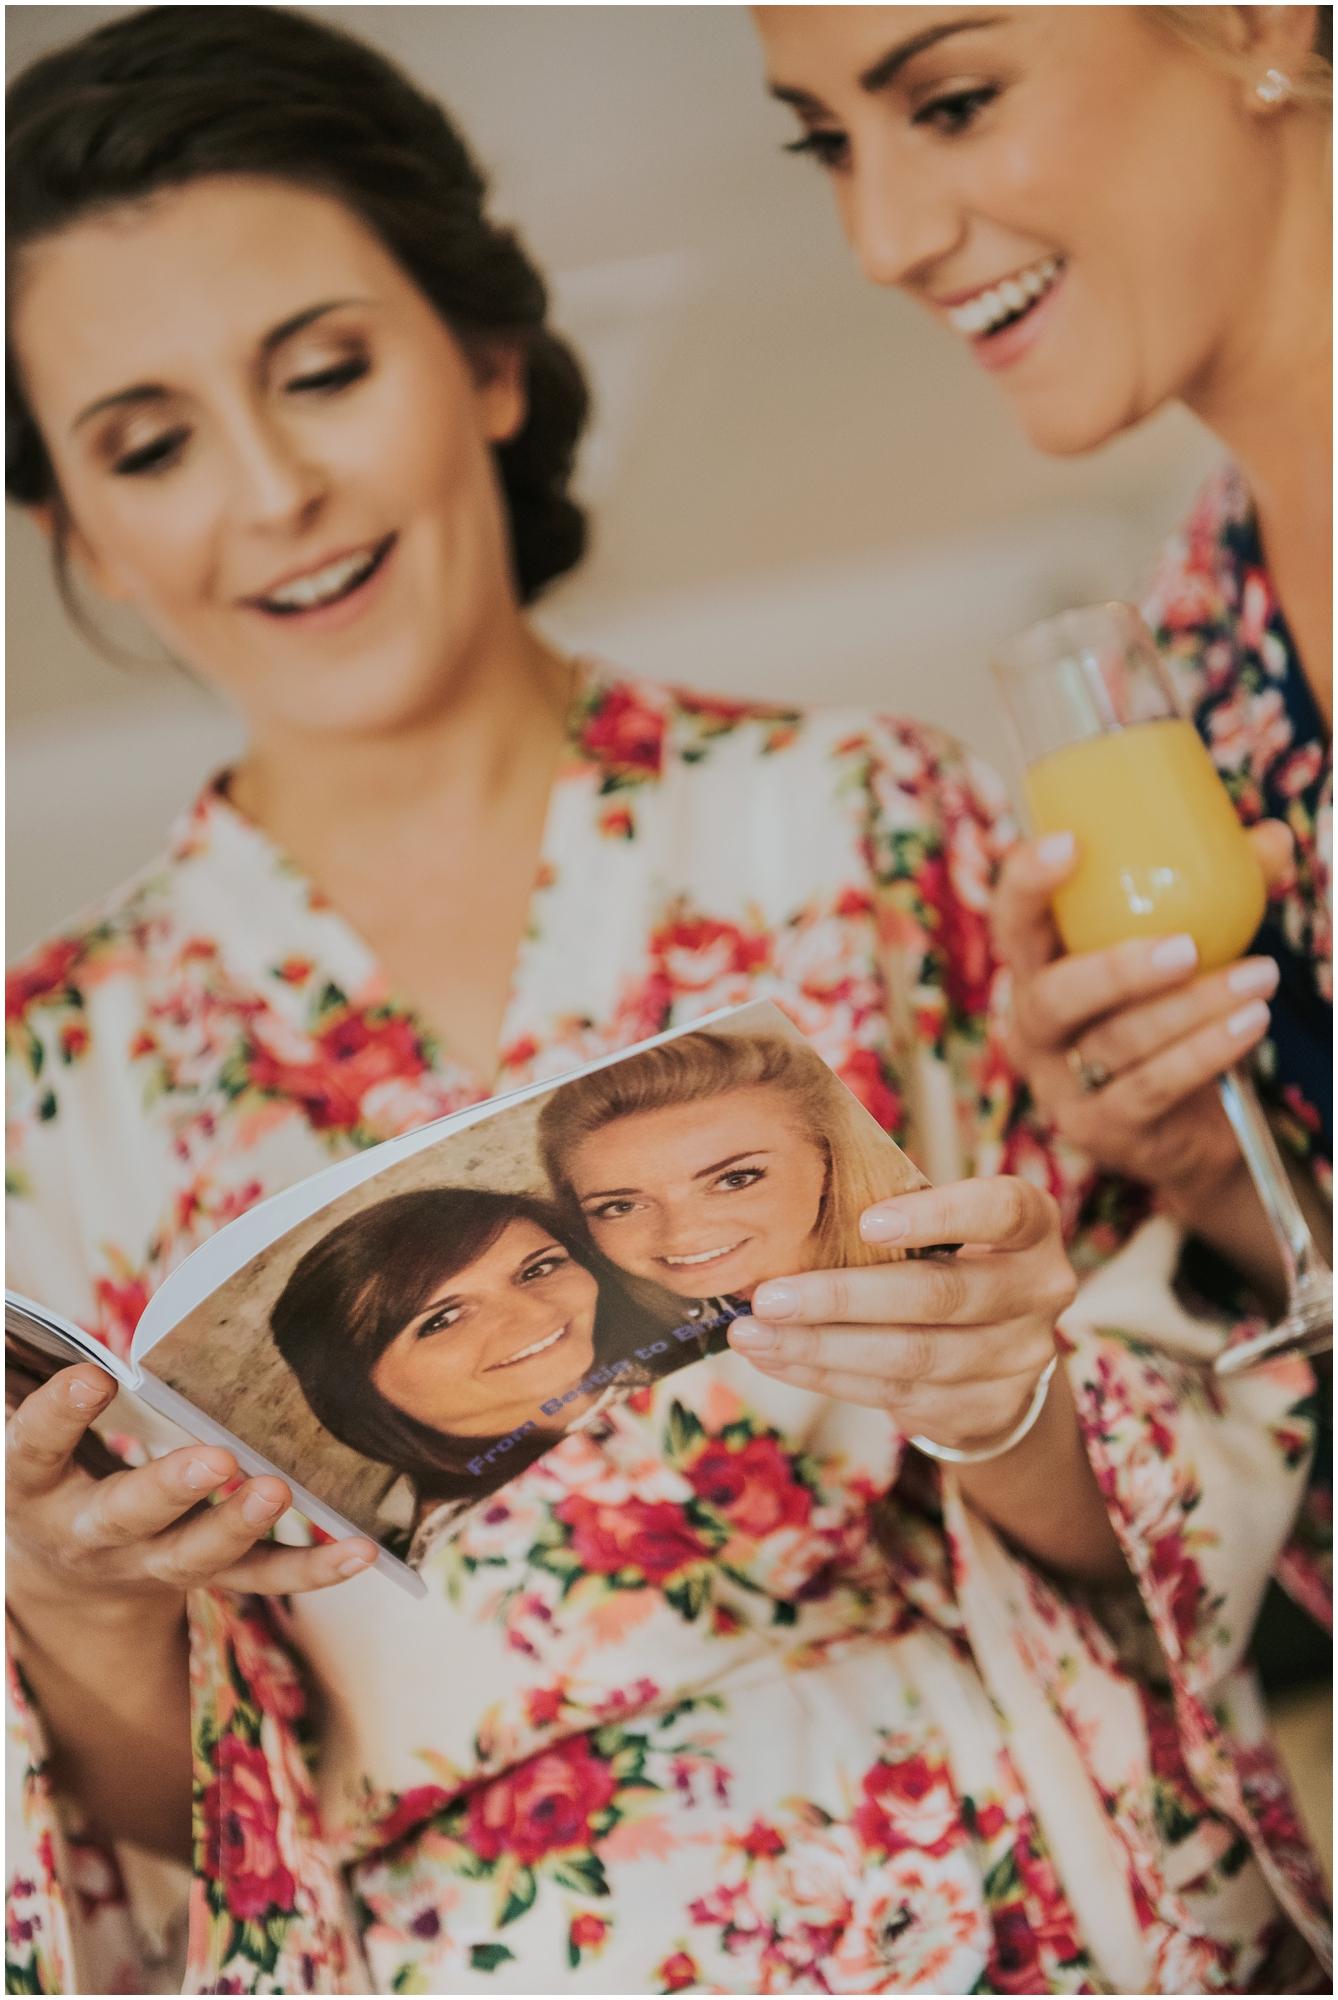 Sopley_Mill_Wedding_SamanthaDavisPhotography003.jpg